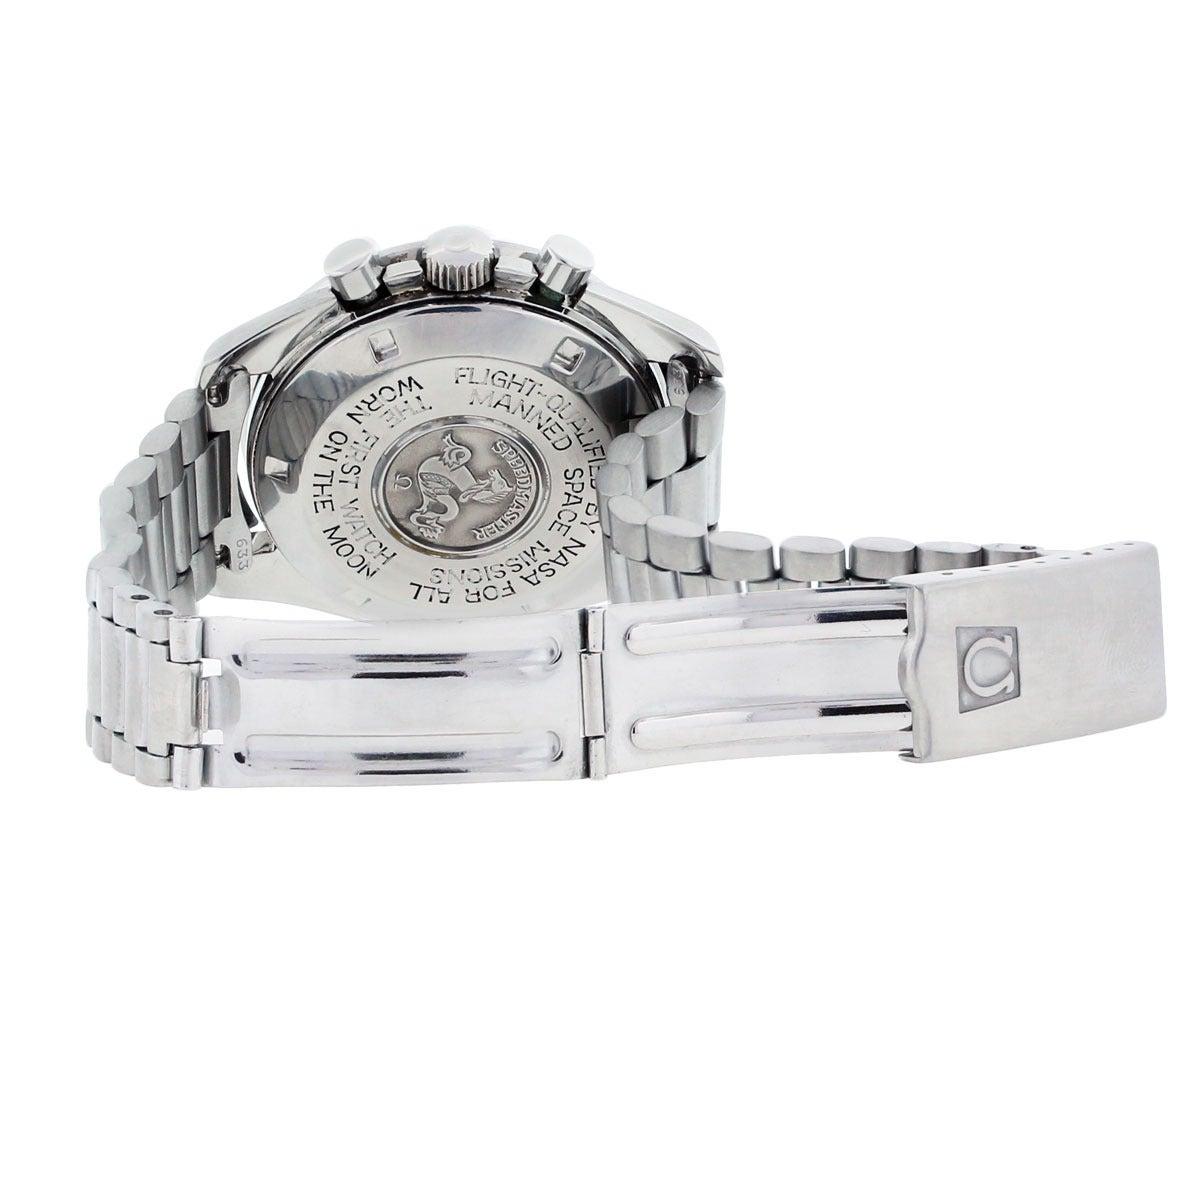 Omega Stainless Steel Speedmaster First Watch Worn on the ...